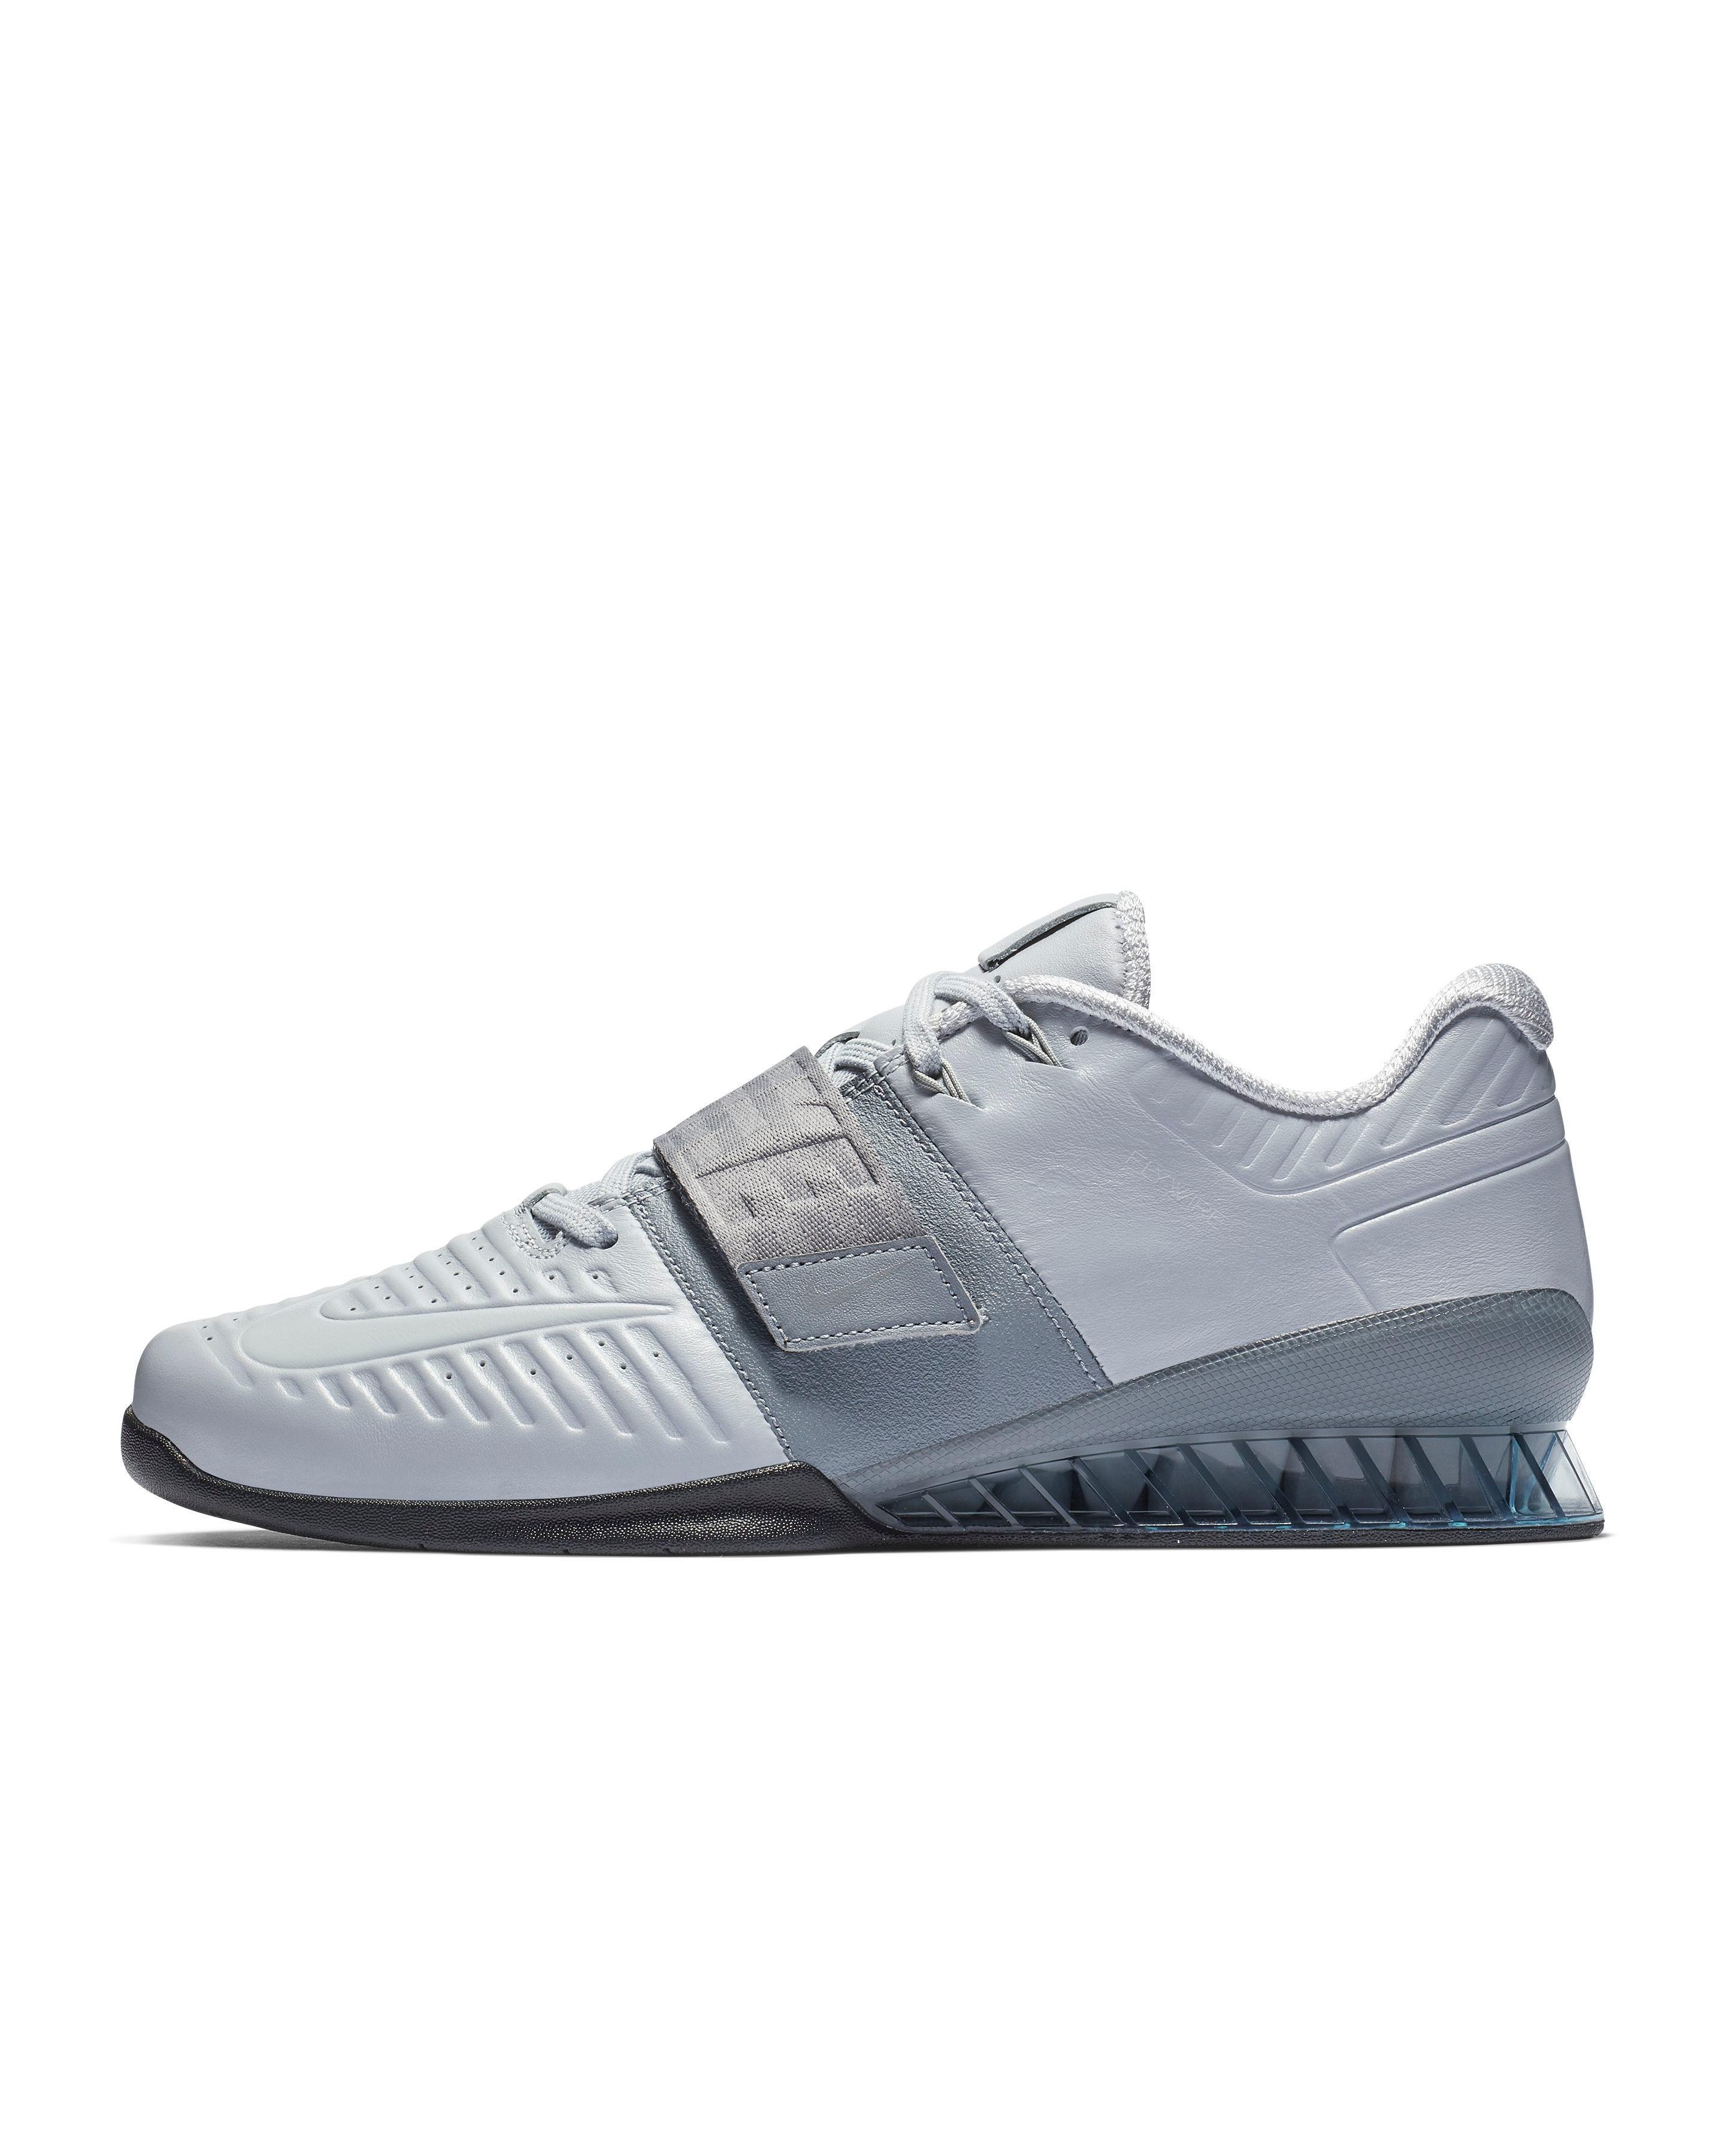 new style a4d48 099f4 Training Shoe Nike Romaleos 3 XD